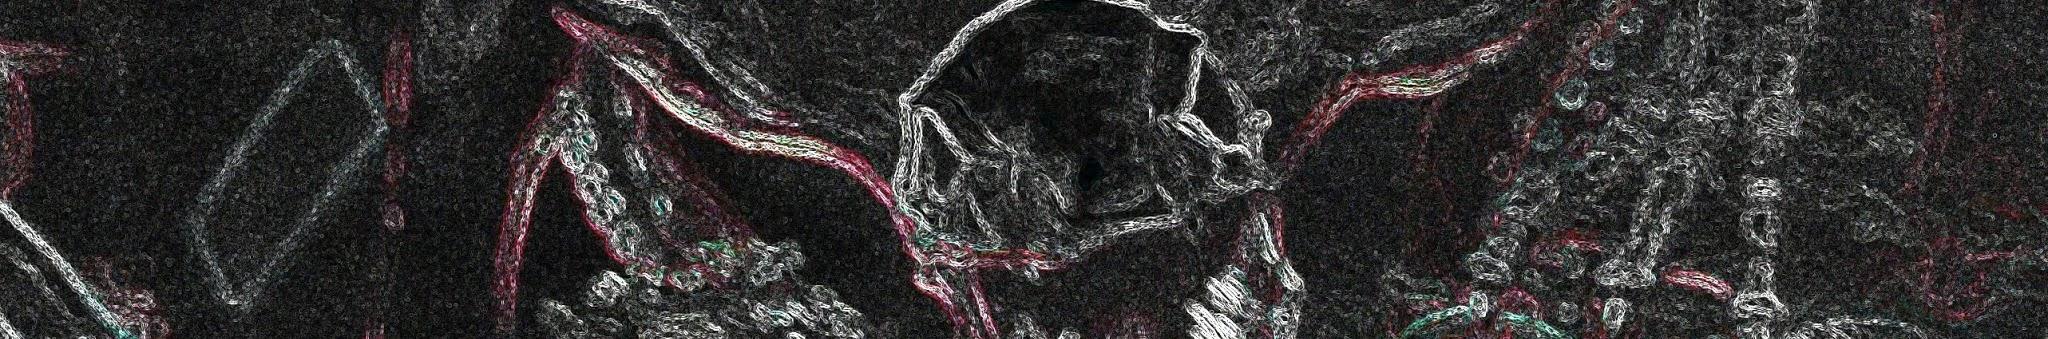 Raiju Kaiju Productions Youtube Channel Analytics And Report Powered By Noxinfluencer Mobile A new pic of pacific rim's raiju. raiju kaiju productions youtube channel